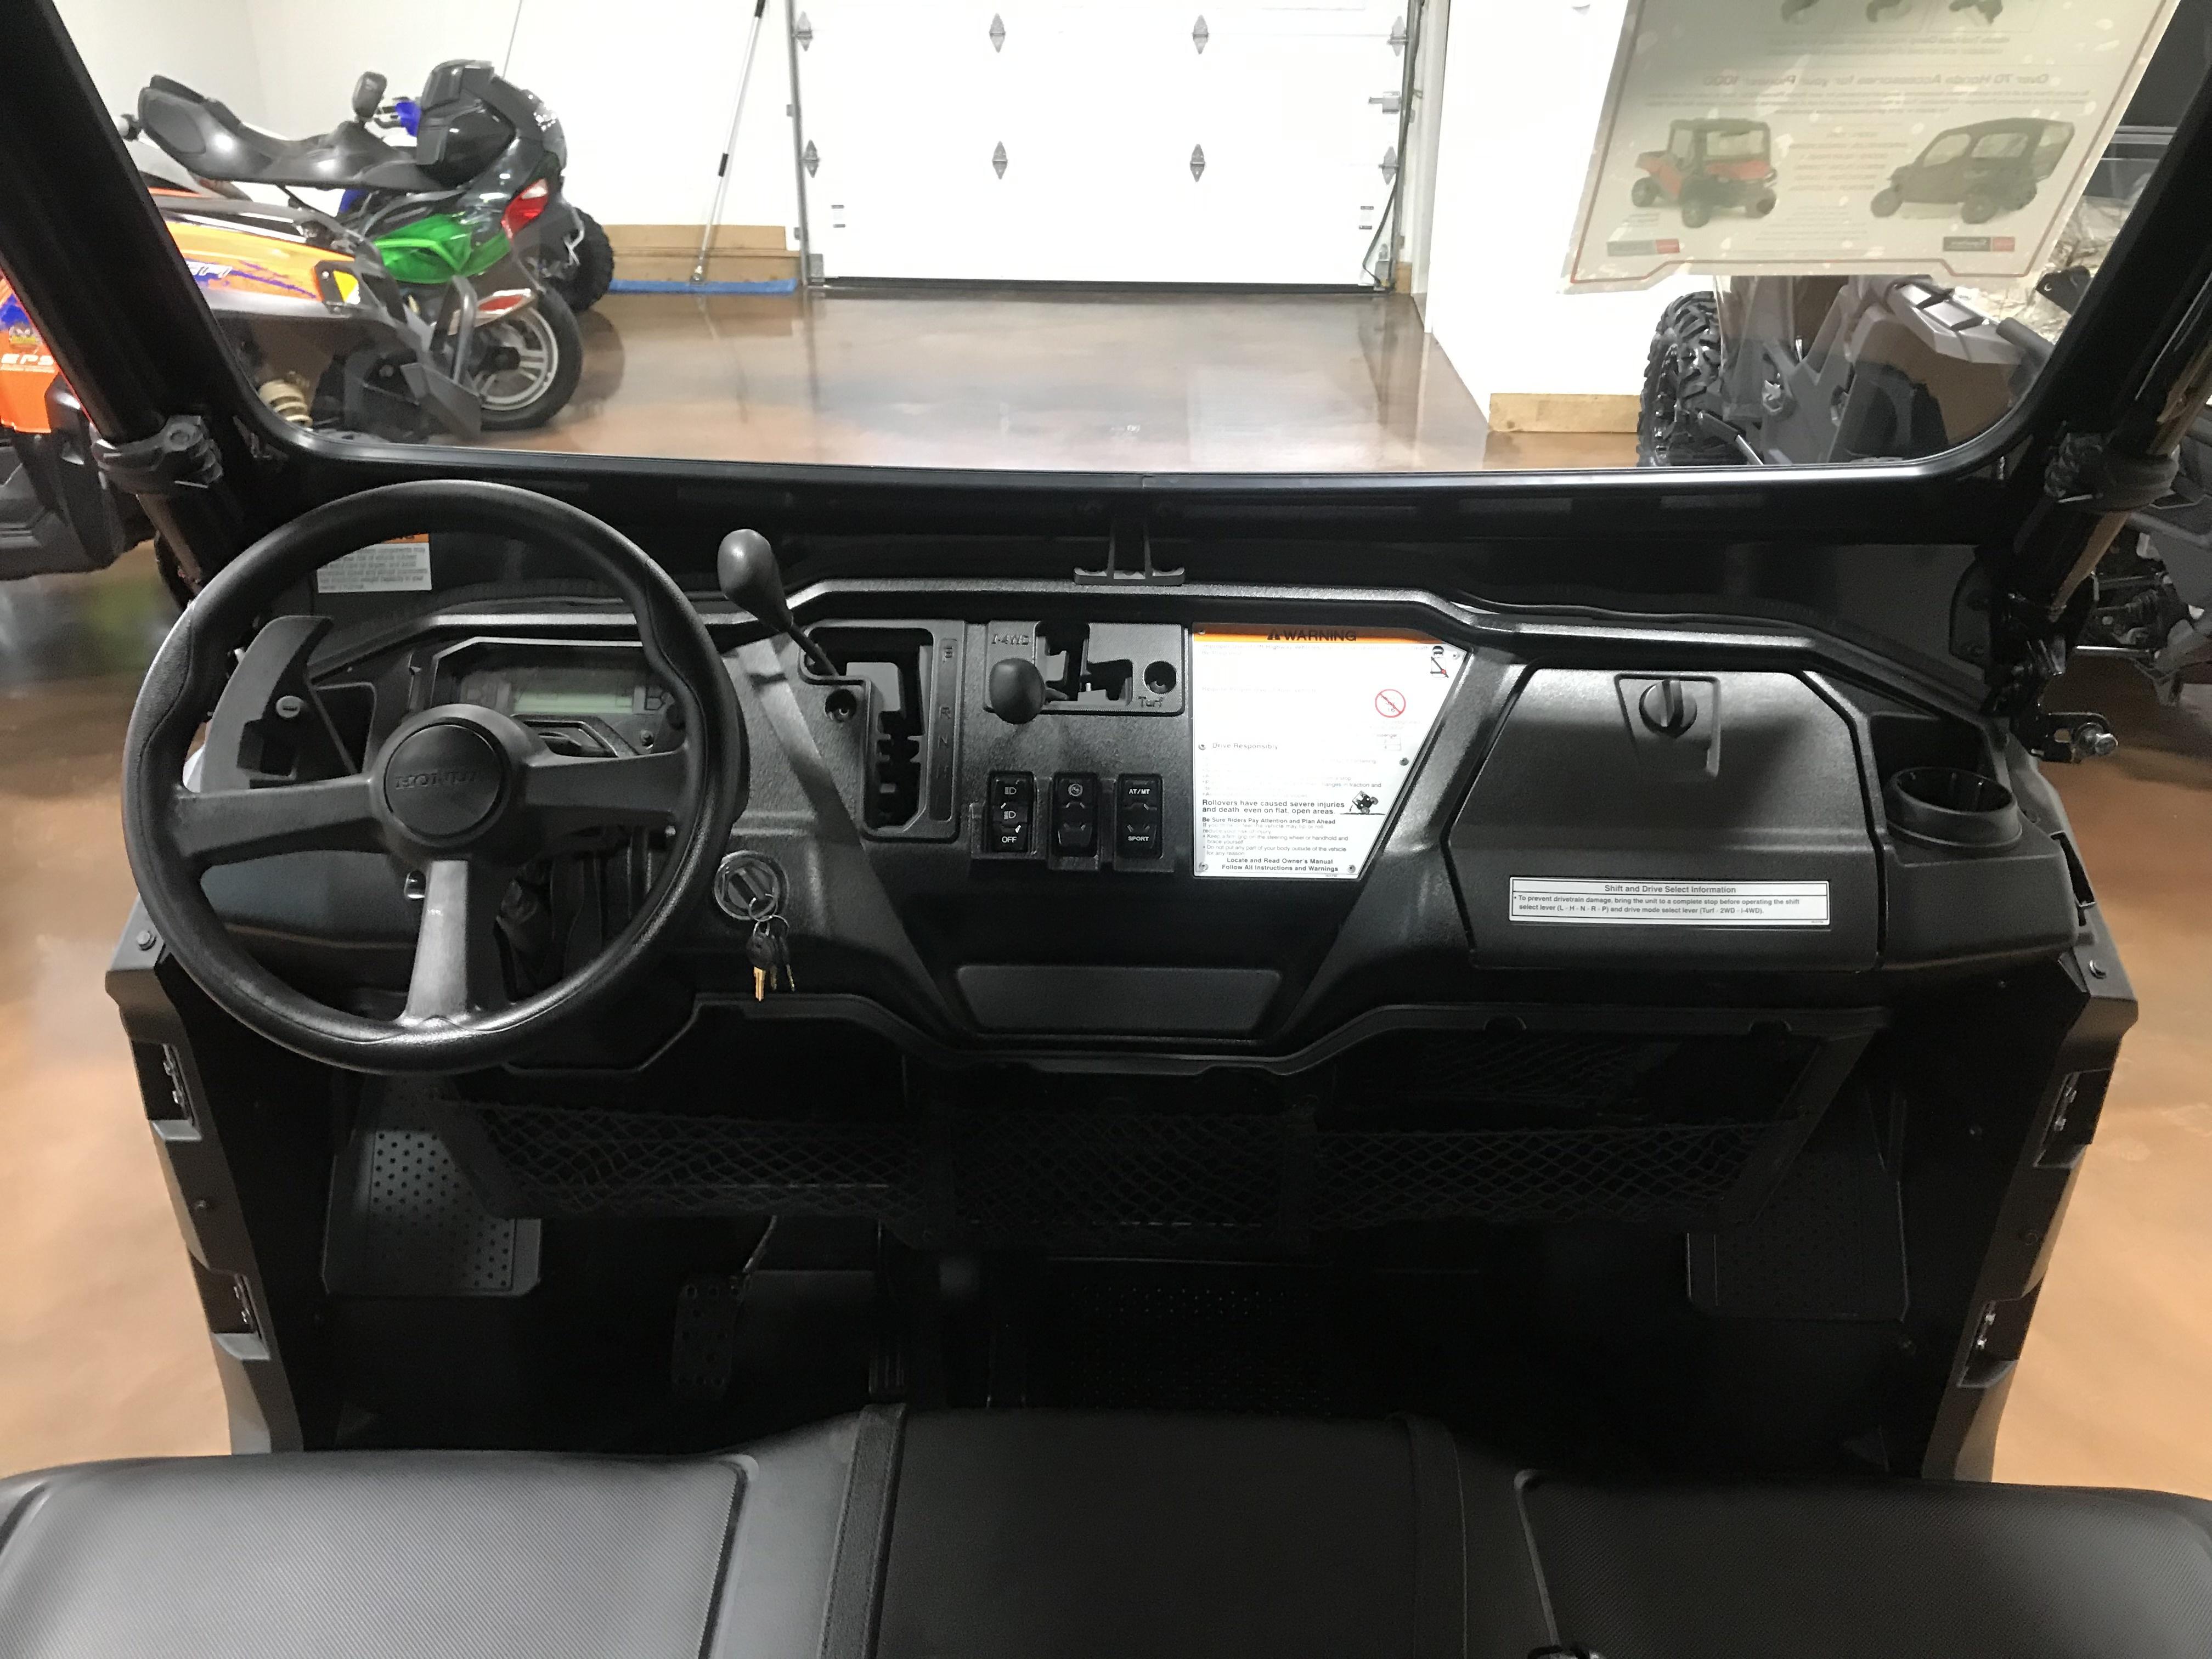 2017 Honda Pioneer 1000 EPS LE - Factory Warranty - Only 5 Miles!